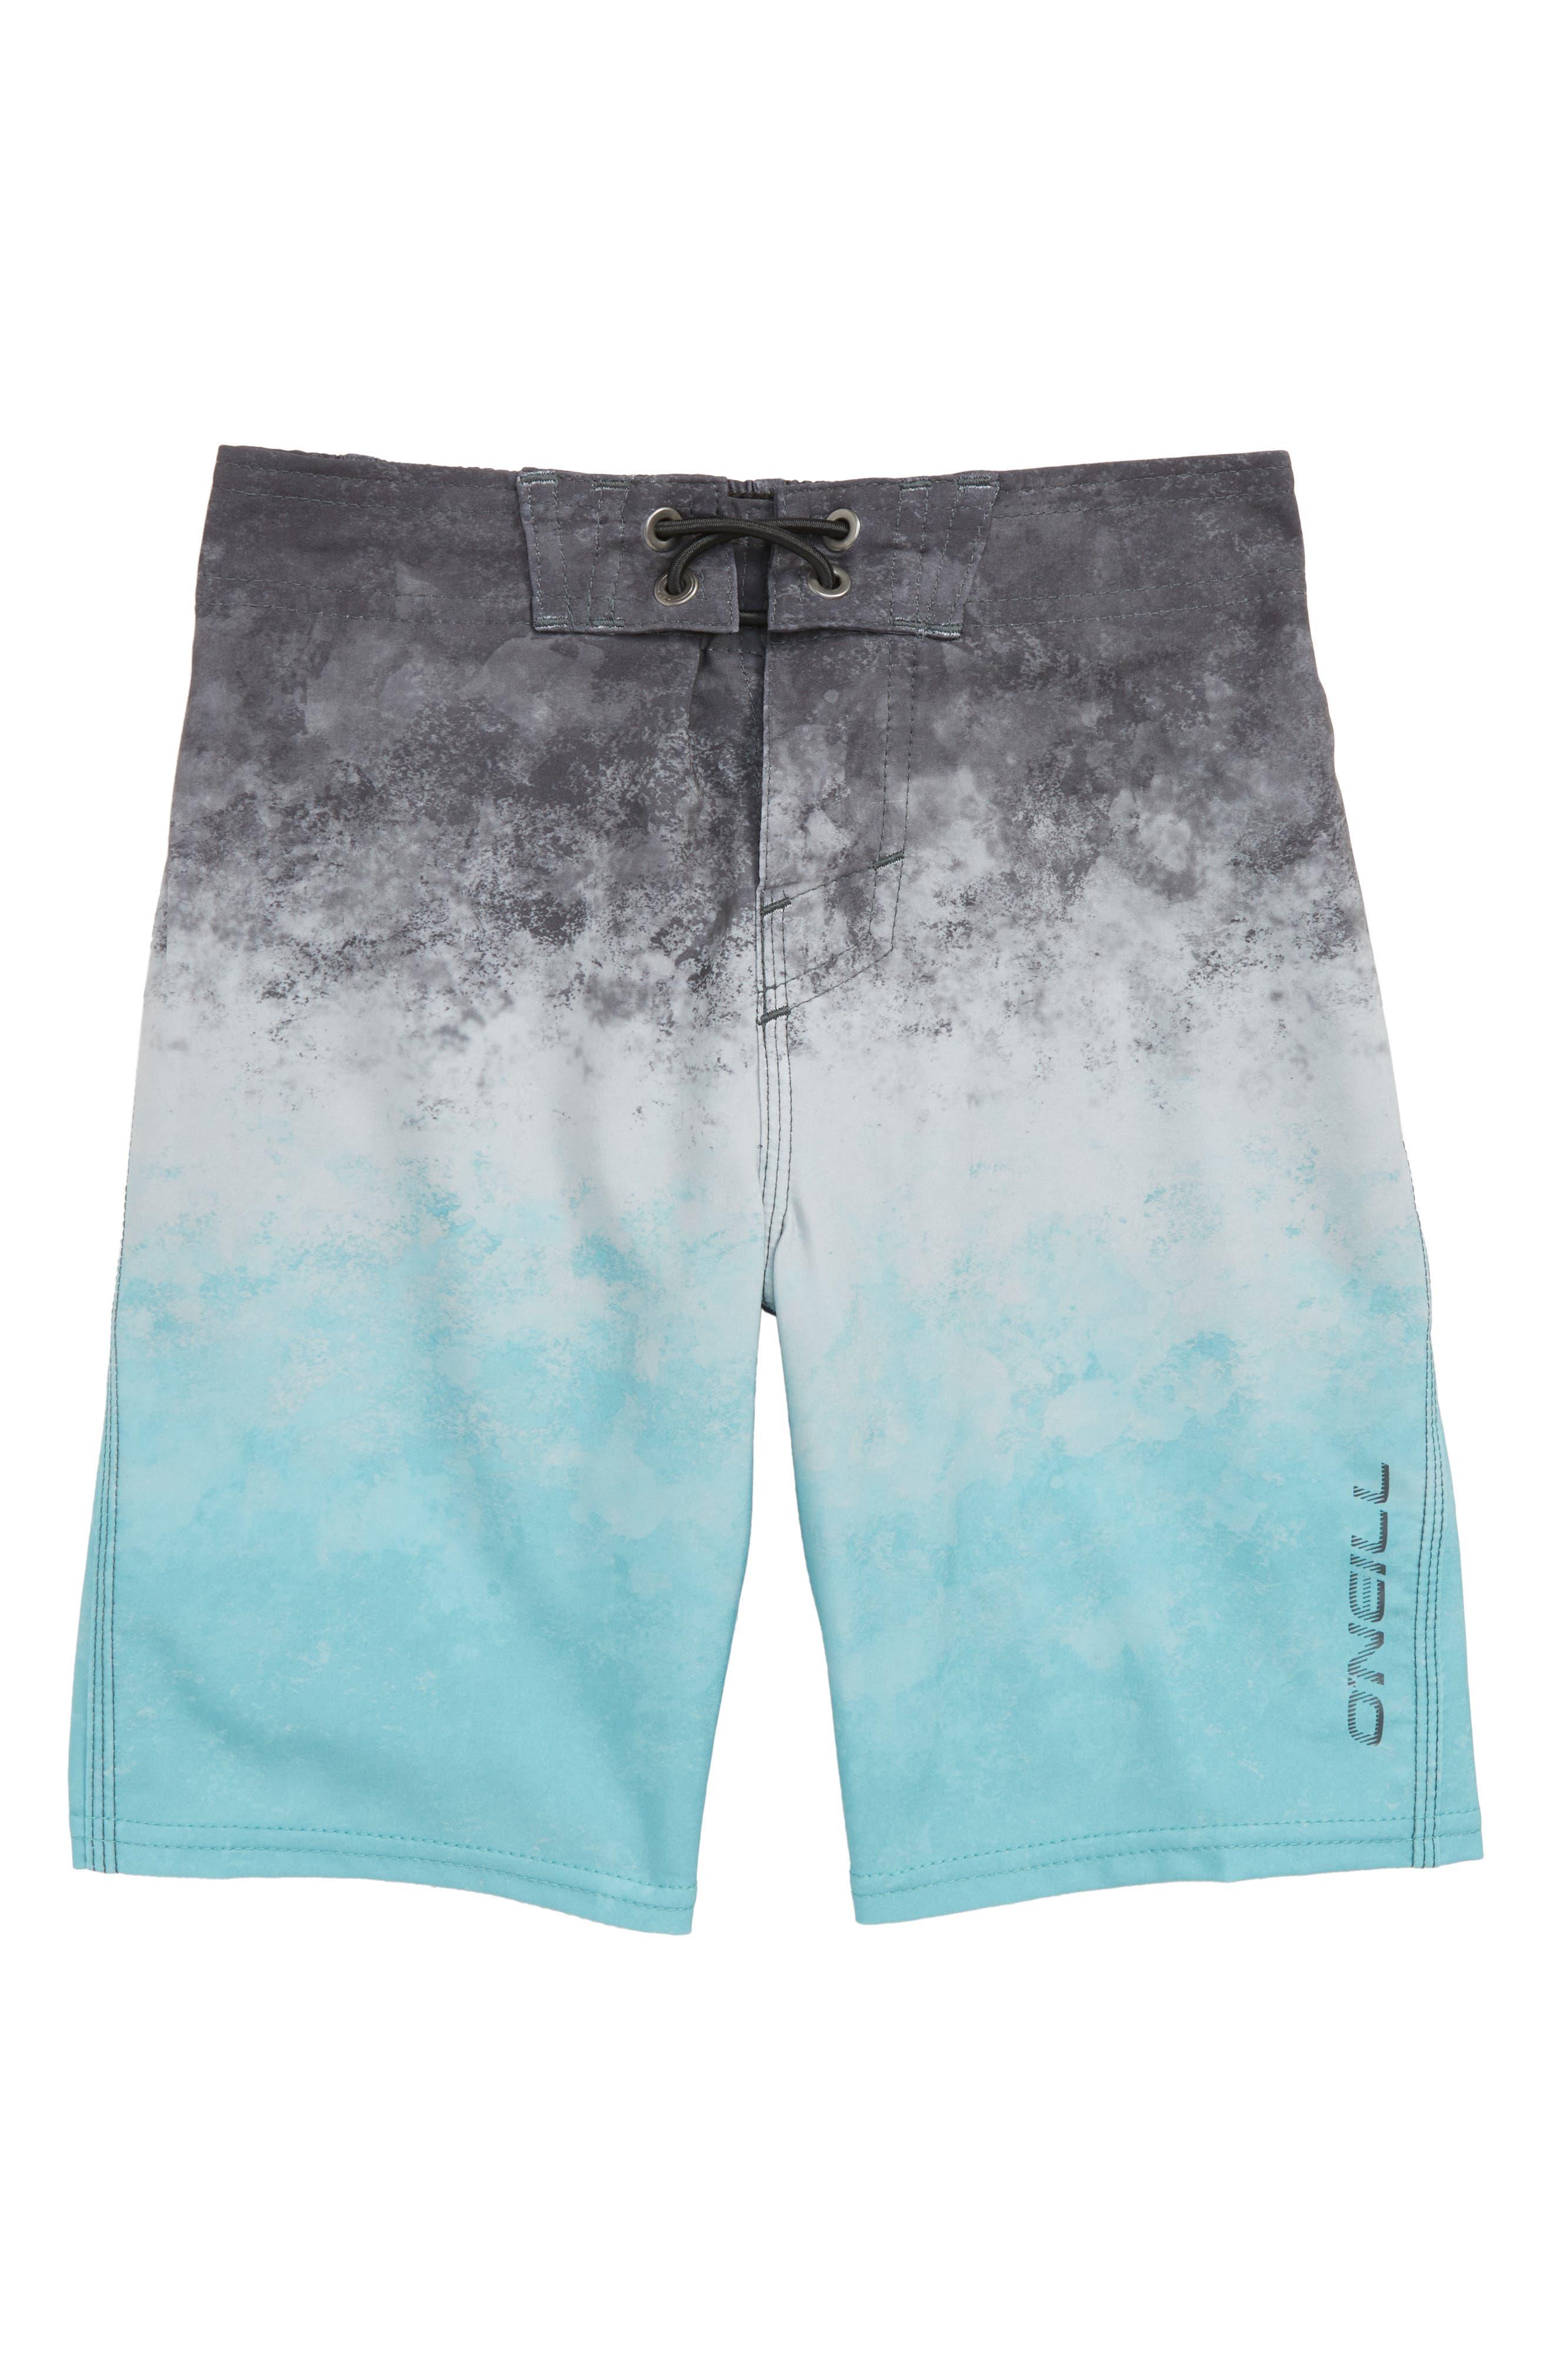 Sneakyfreak Surface Board Shorts,                         Main,                         color, Aqua